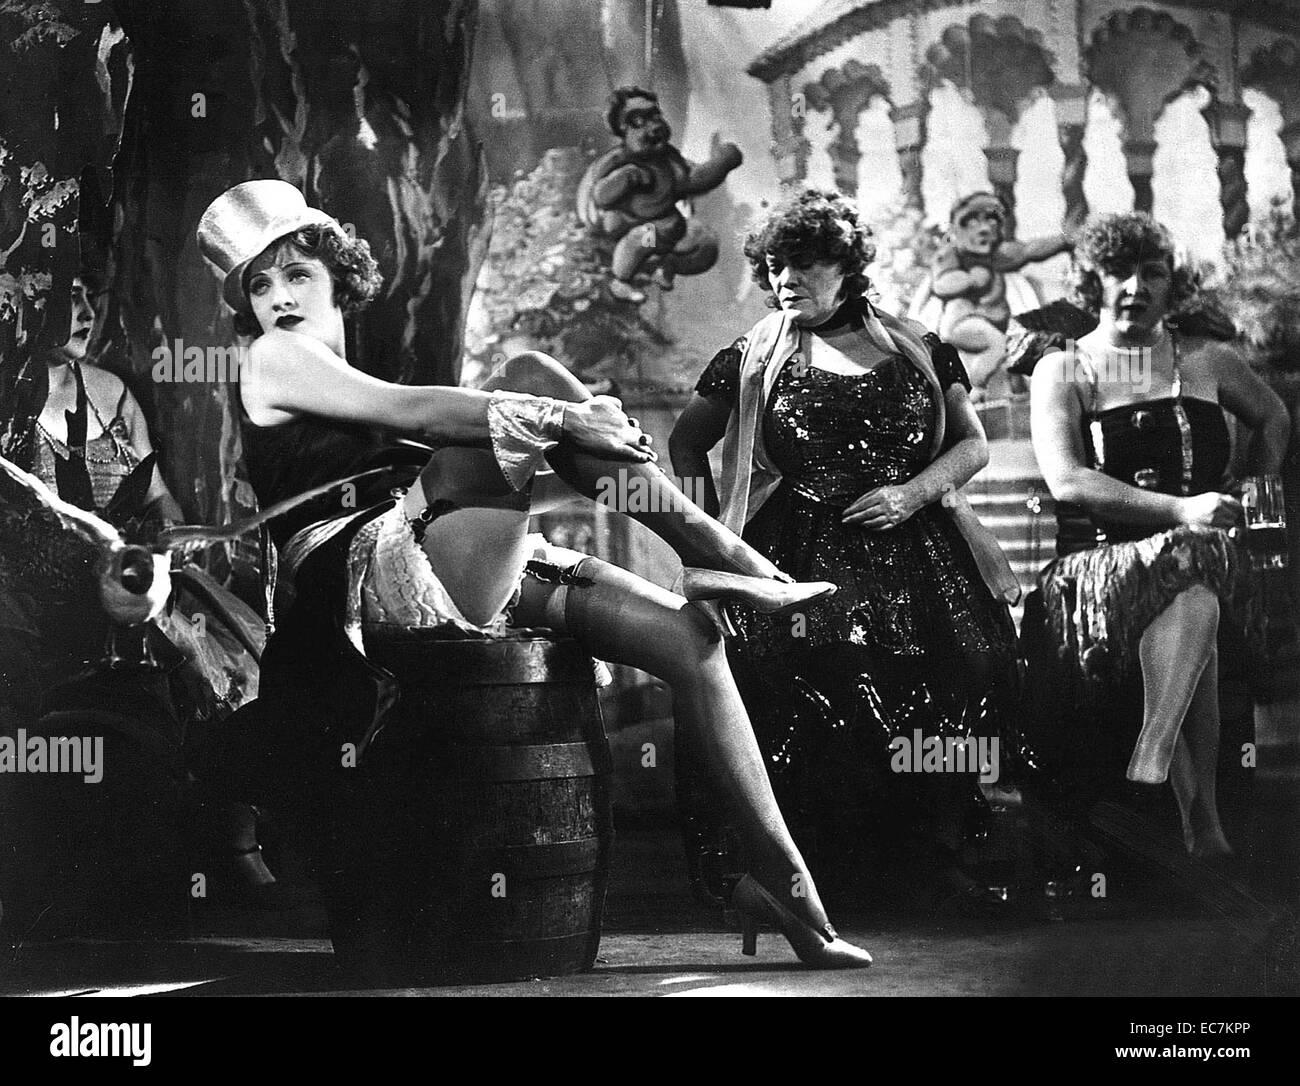 Marlene Dietrich, German, actress, movies, film, cinema, icon, singer, Blue Angel, top hat, tuxedo - Stock Image